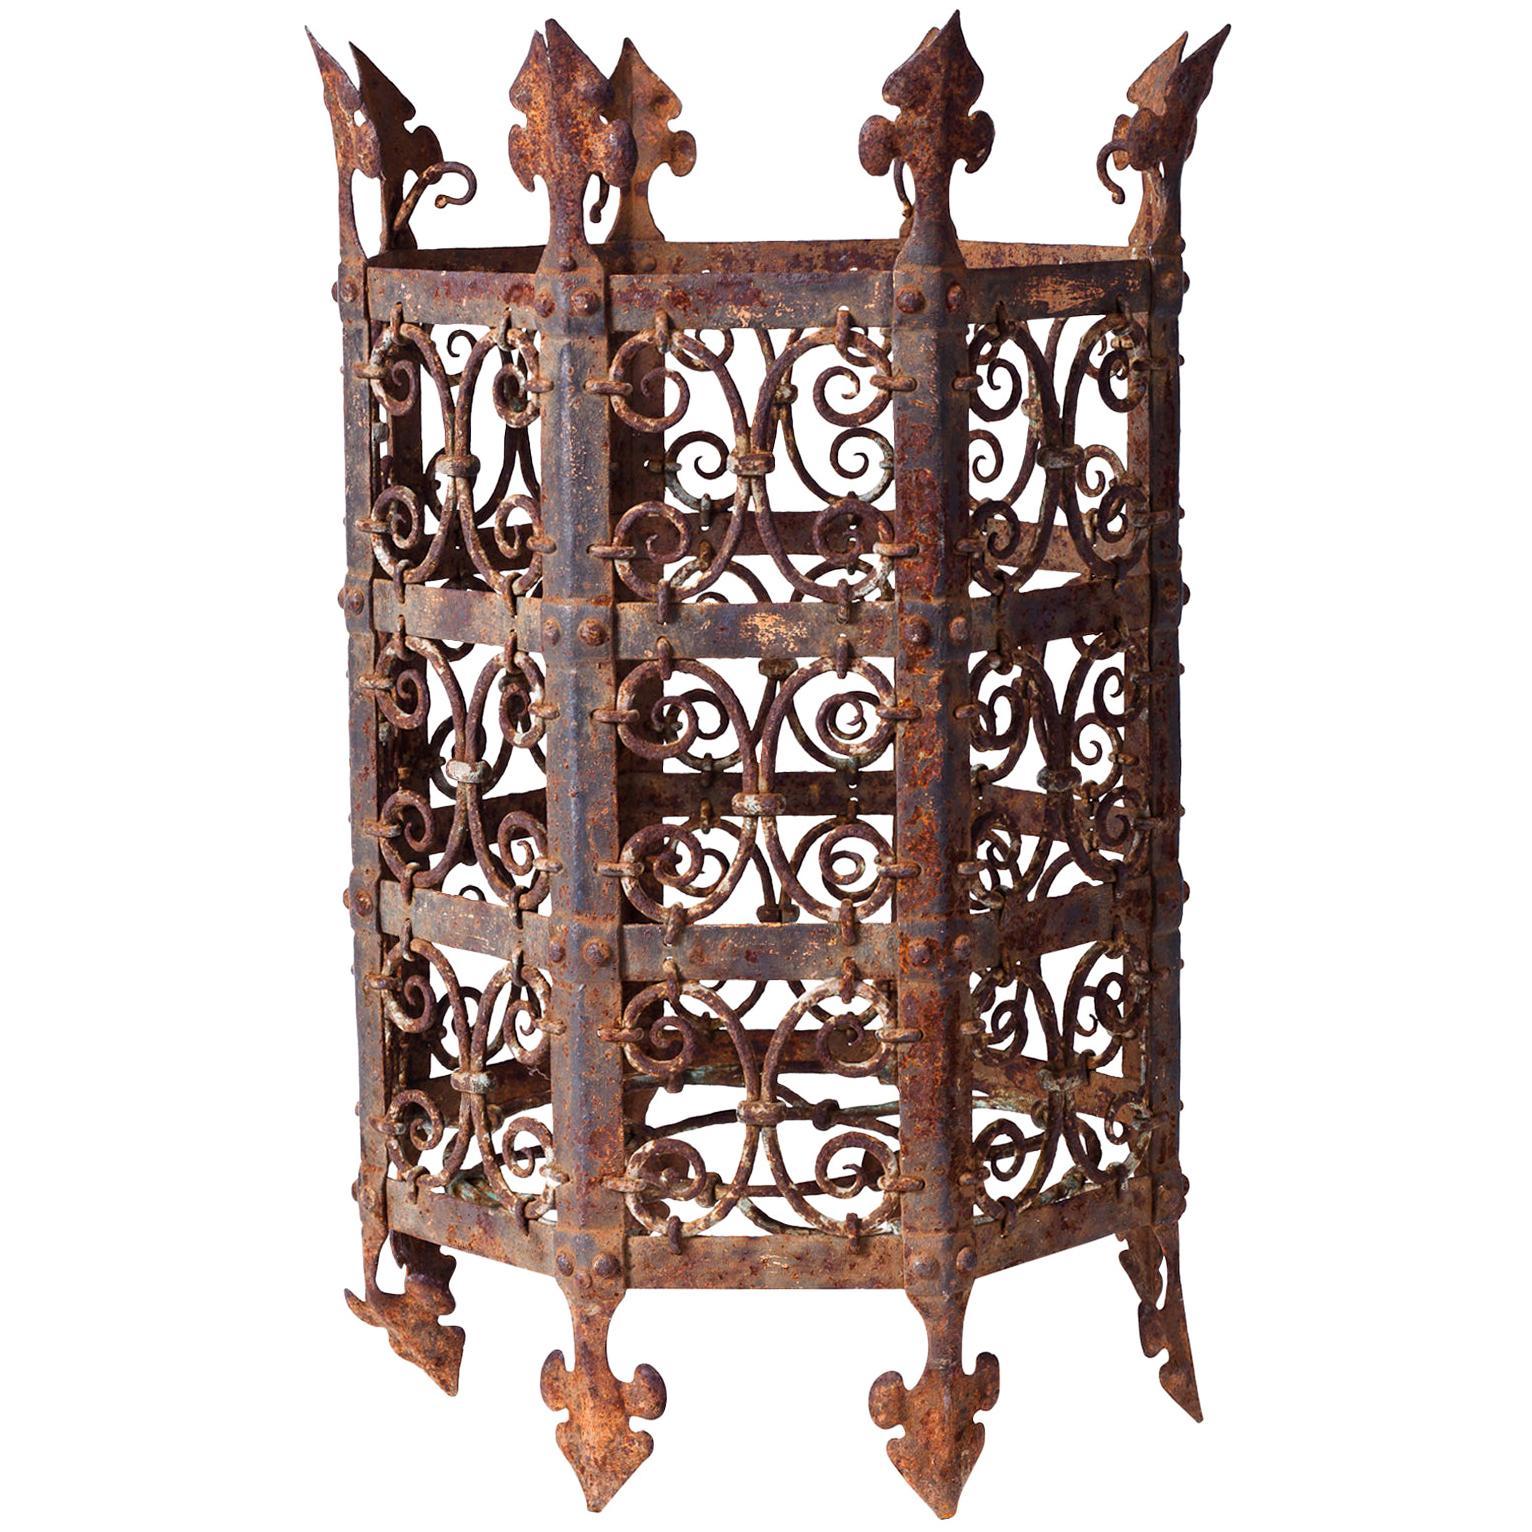 19th Century Decorative Iron Jardinière from France